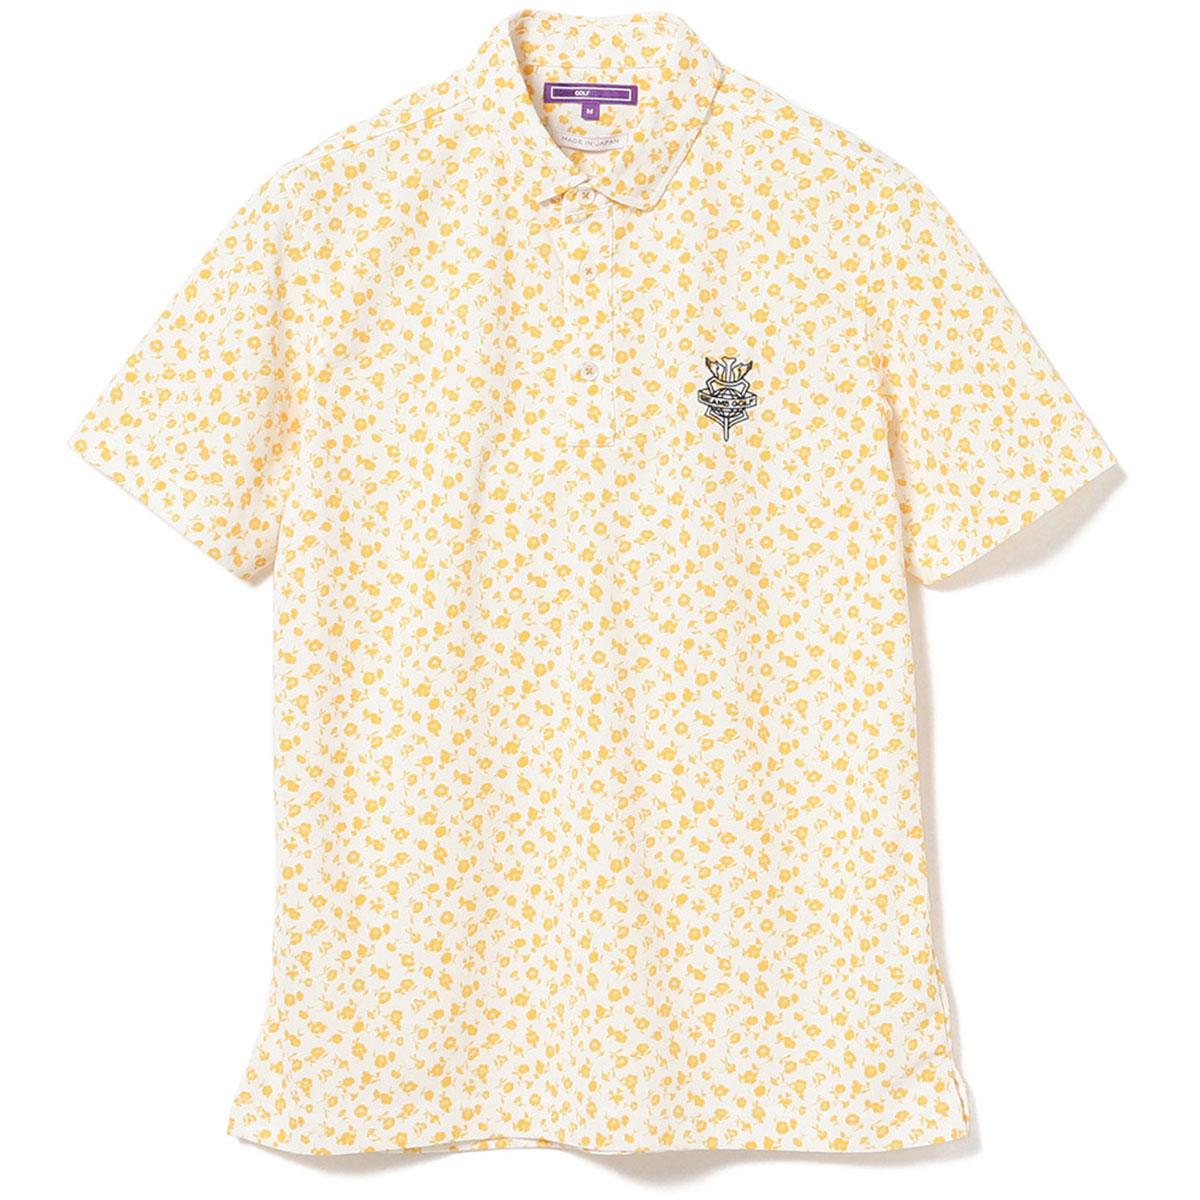 BEAMS GOLF PURPLE LABEL アサガオ プリント ポロシャツ